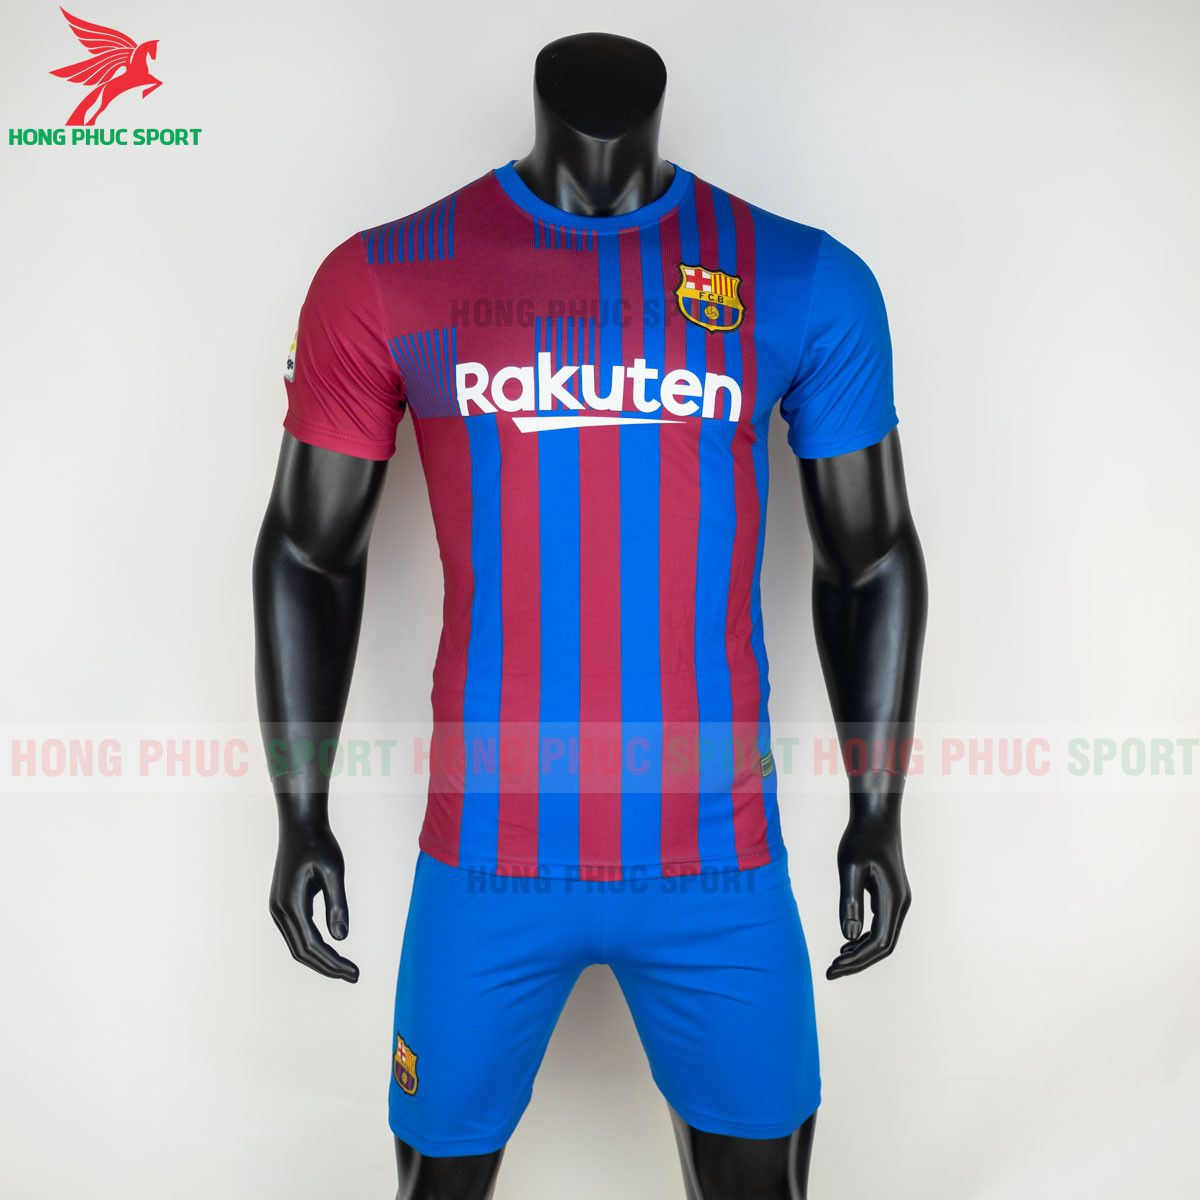 https://cdn.hongphucsport.com/unsafe/s4.shopbay.vn/files/285/ao-bong-da-barcelona-2021-2022-san-nha-hang-thai-2-60d2fcee6e5ba.jpg